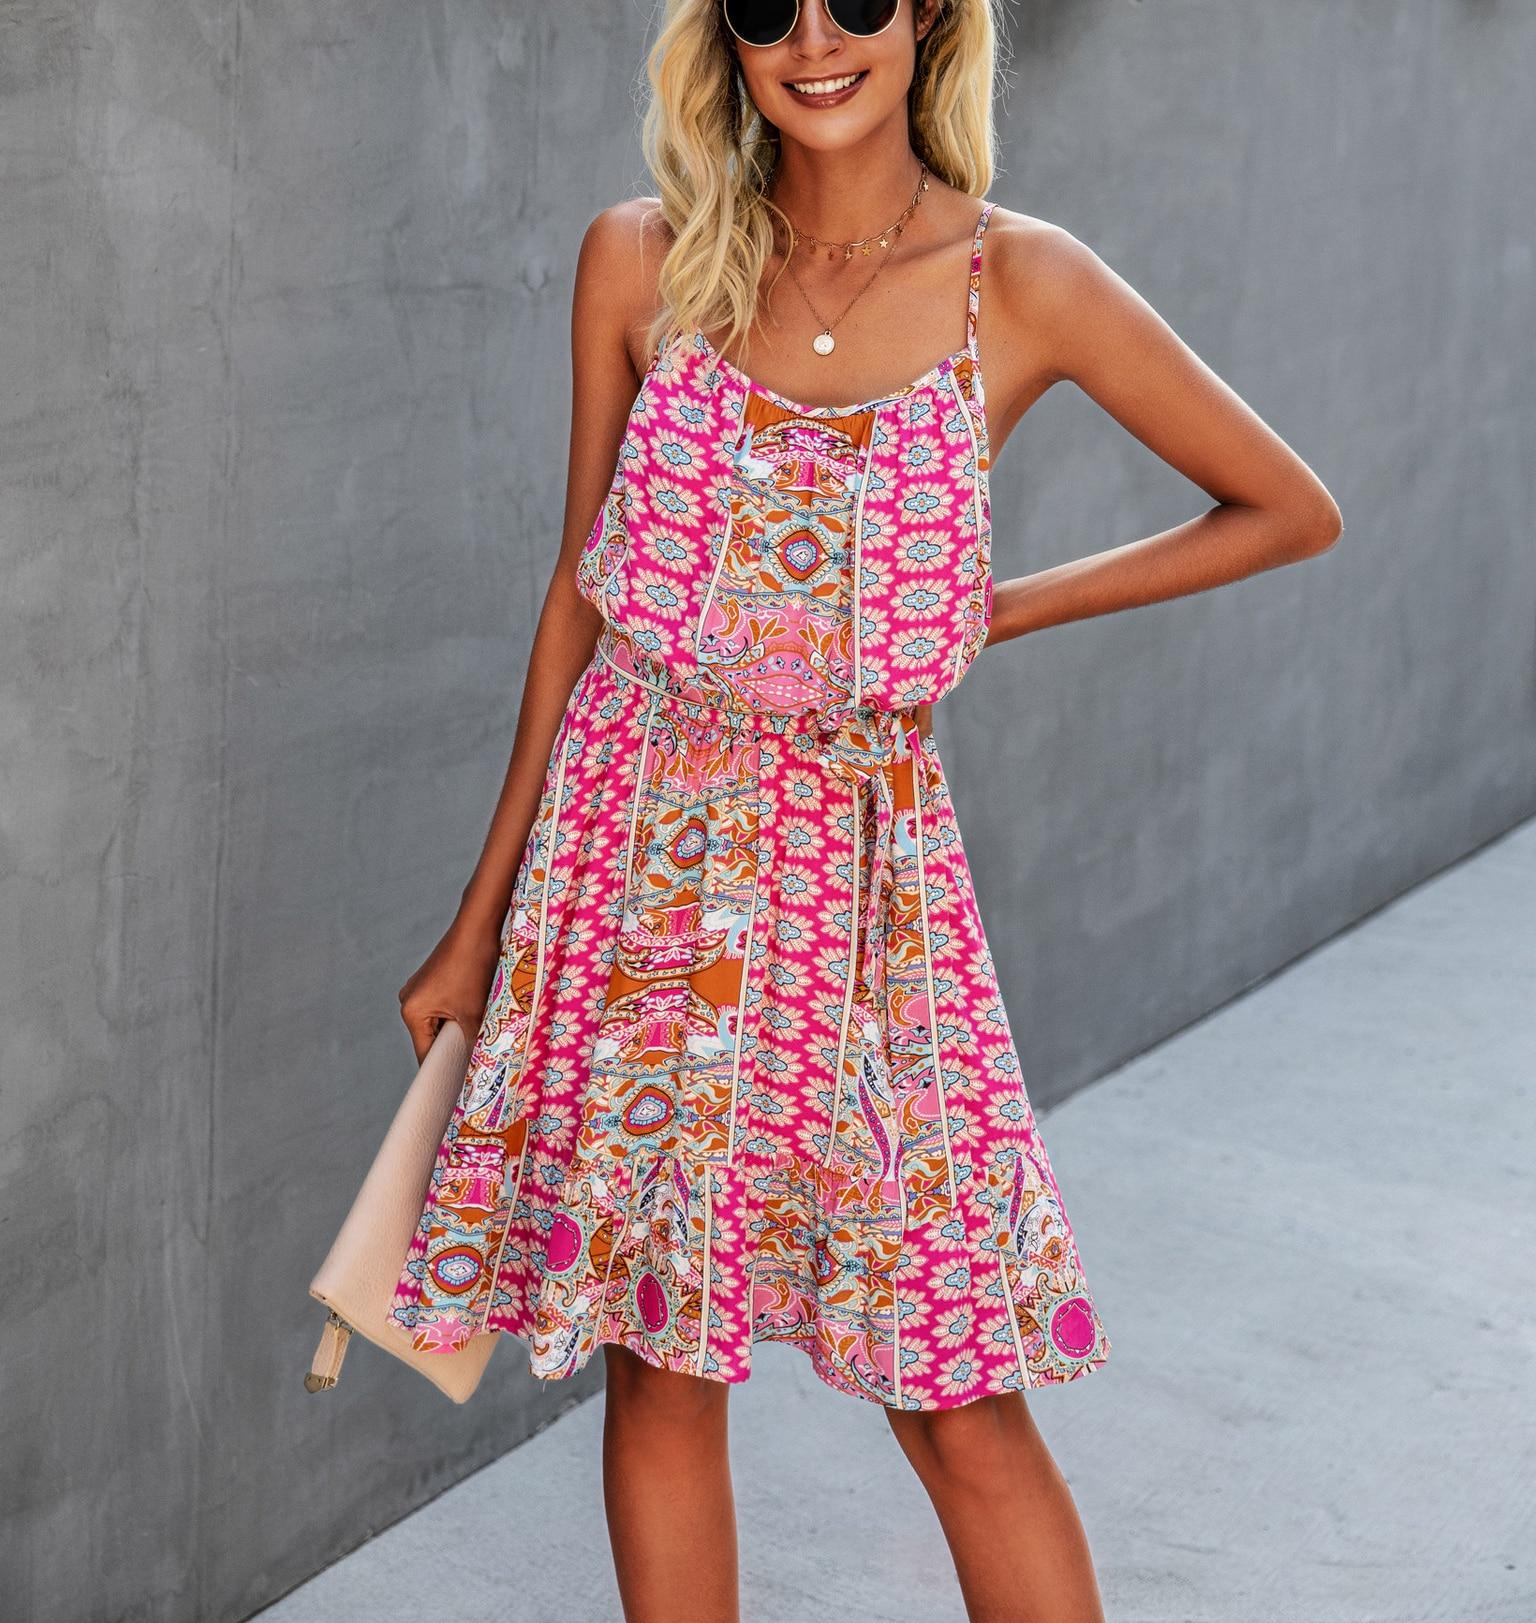 2021 Sexy Spaghetti Strap Dress Chiffon Floral Boho Women Backless Midi Summer Elegant Female Beach Party